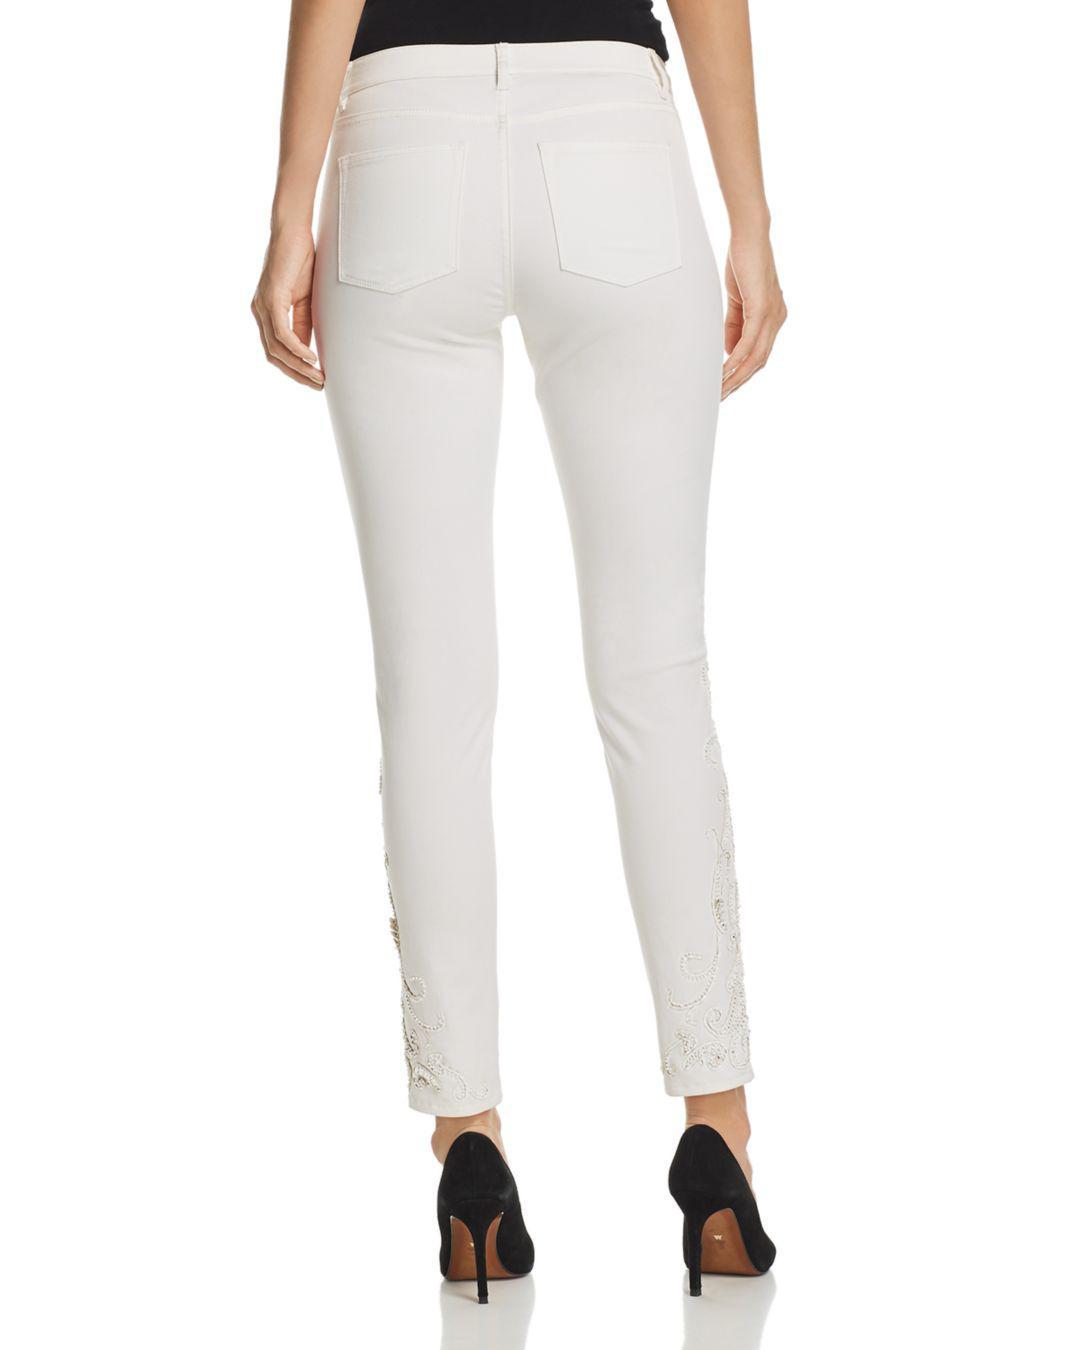 Elie Tahari Denim Azella Embellished Jeans In White